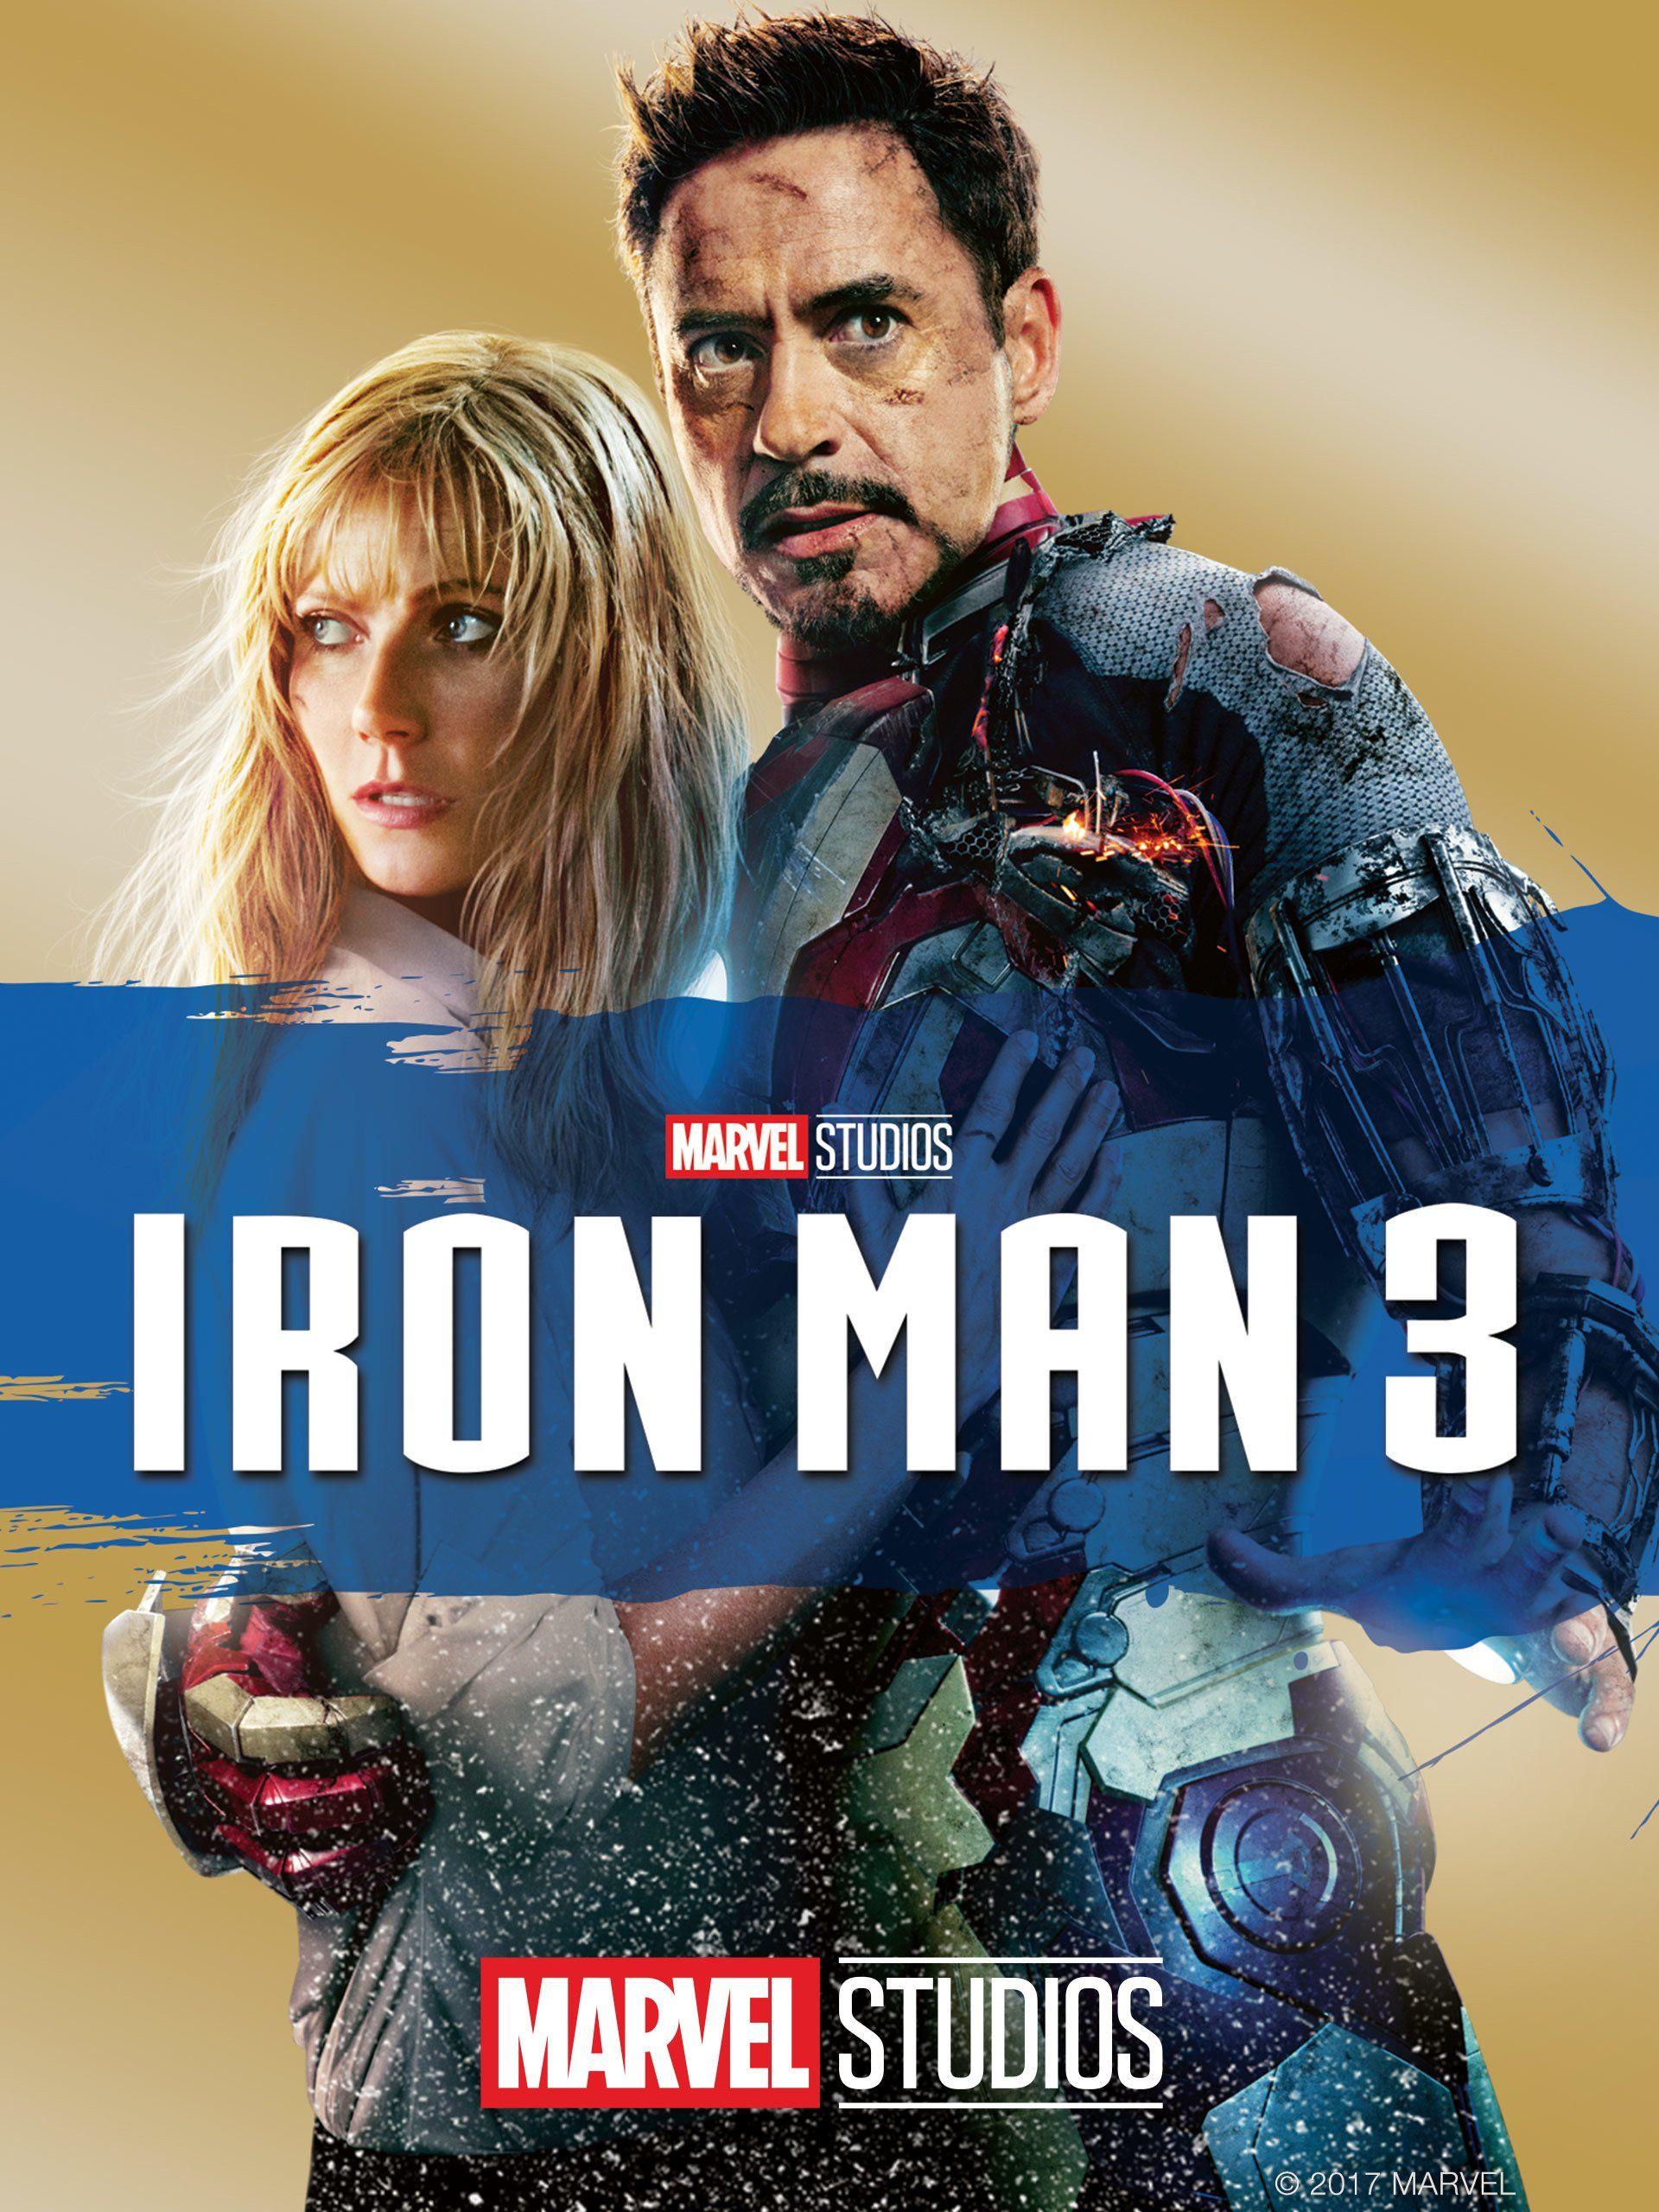 Iron Man 3 (2013) Dual Audio (Eng-Hindi) 480p BRRip | Marvel Studios